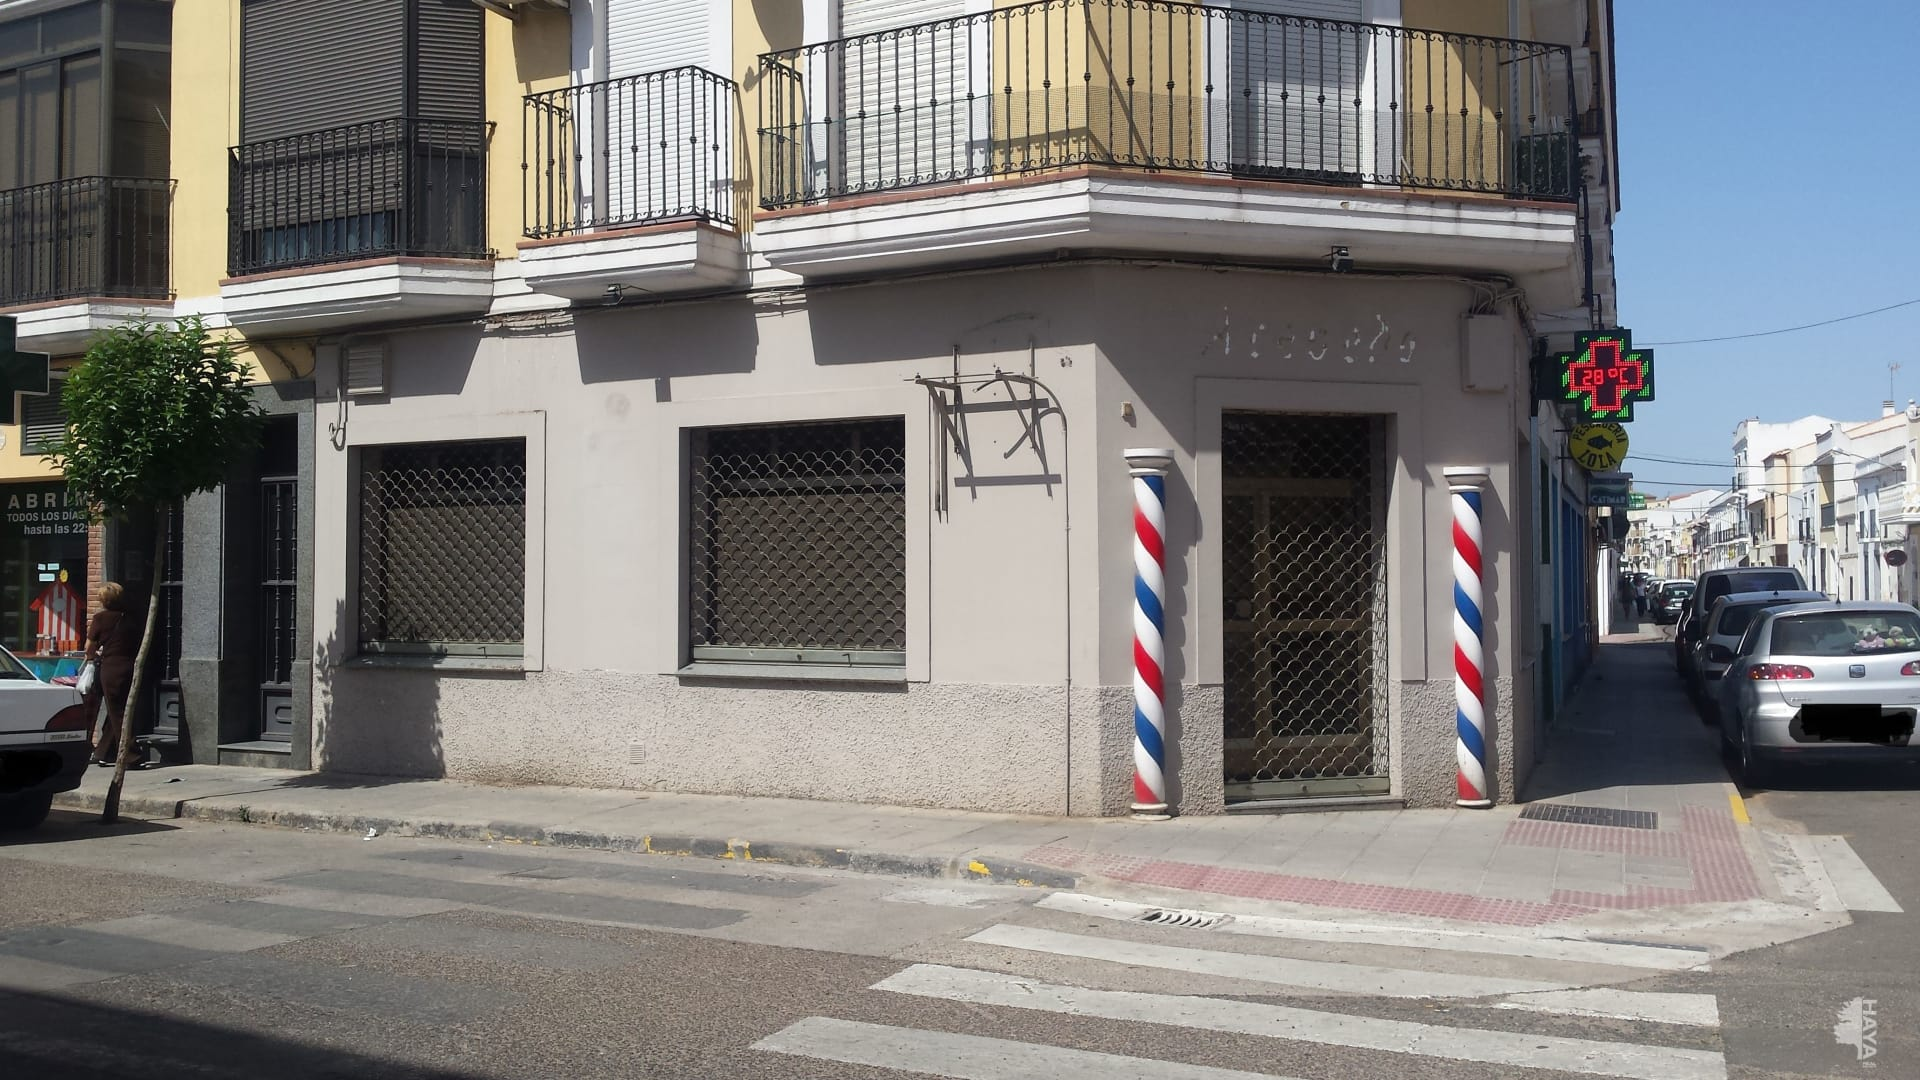 Local en venta en Montijo, Badajoz, Calle Mendez Nuñez, 45.100 €, 52 m2